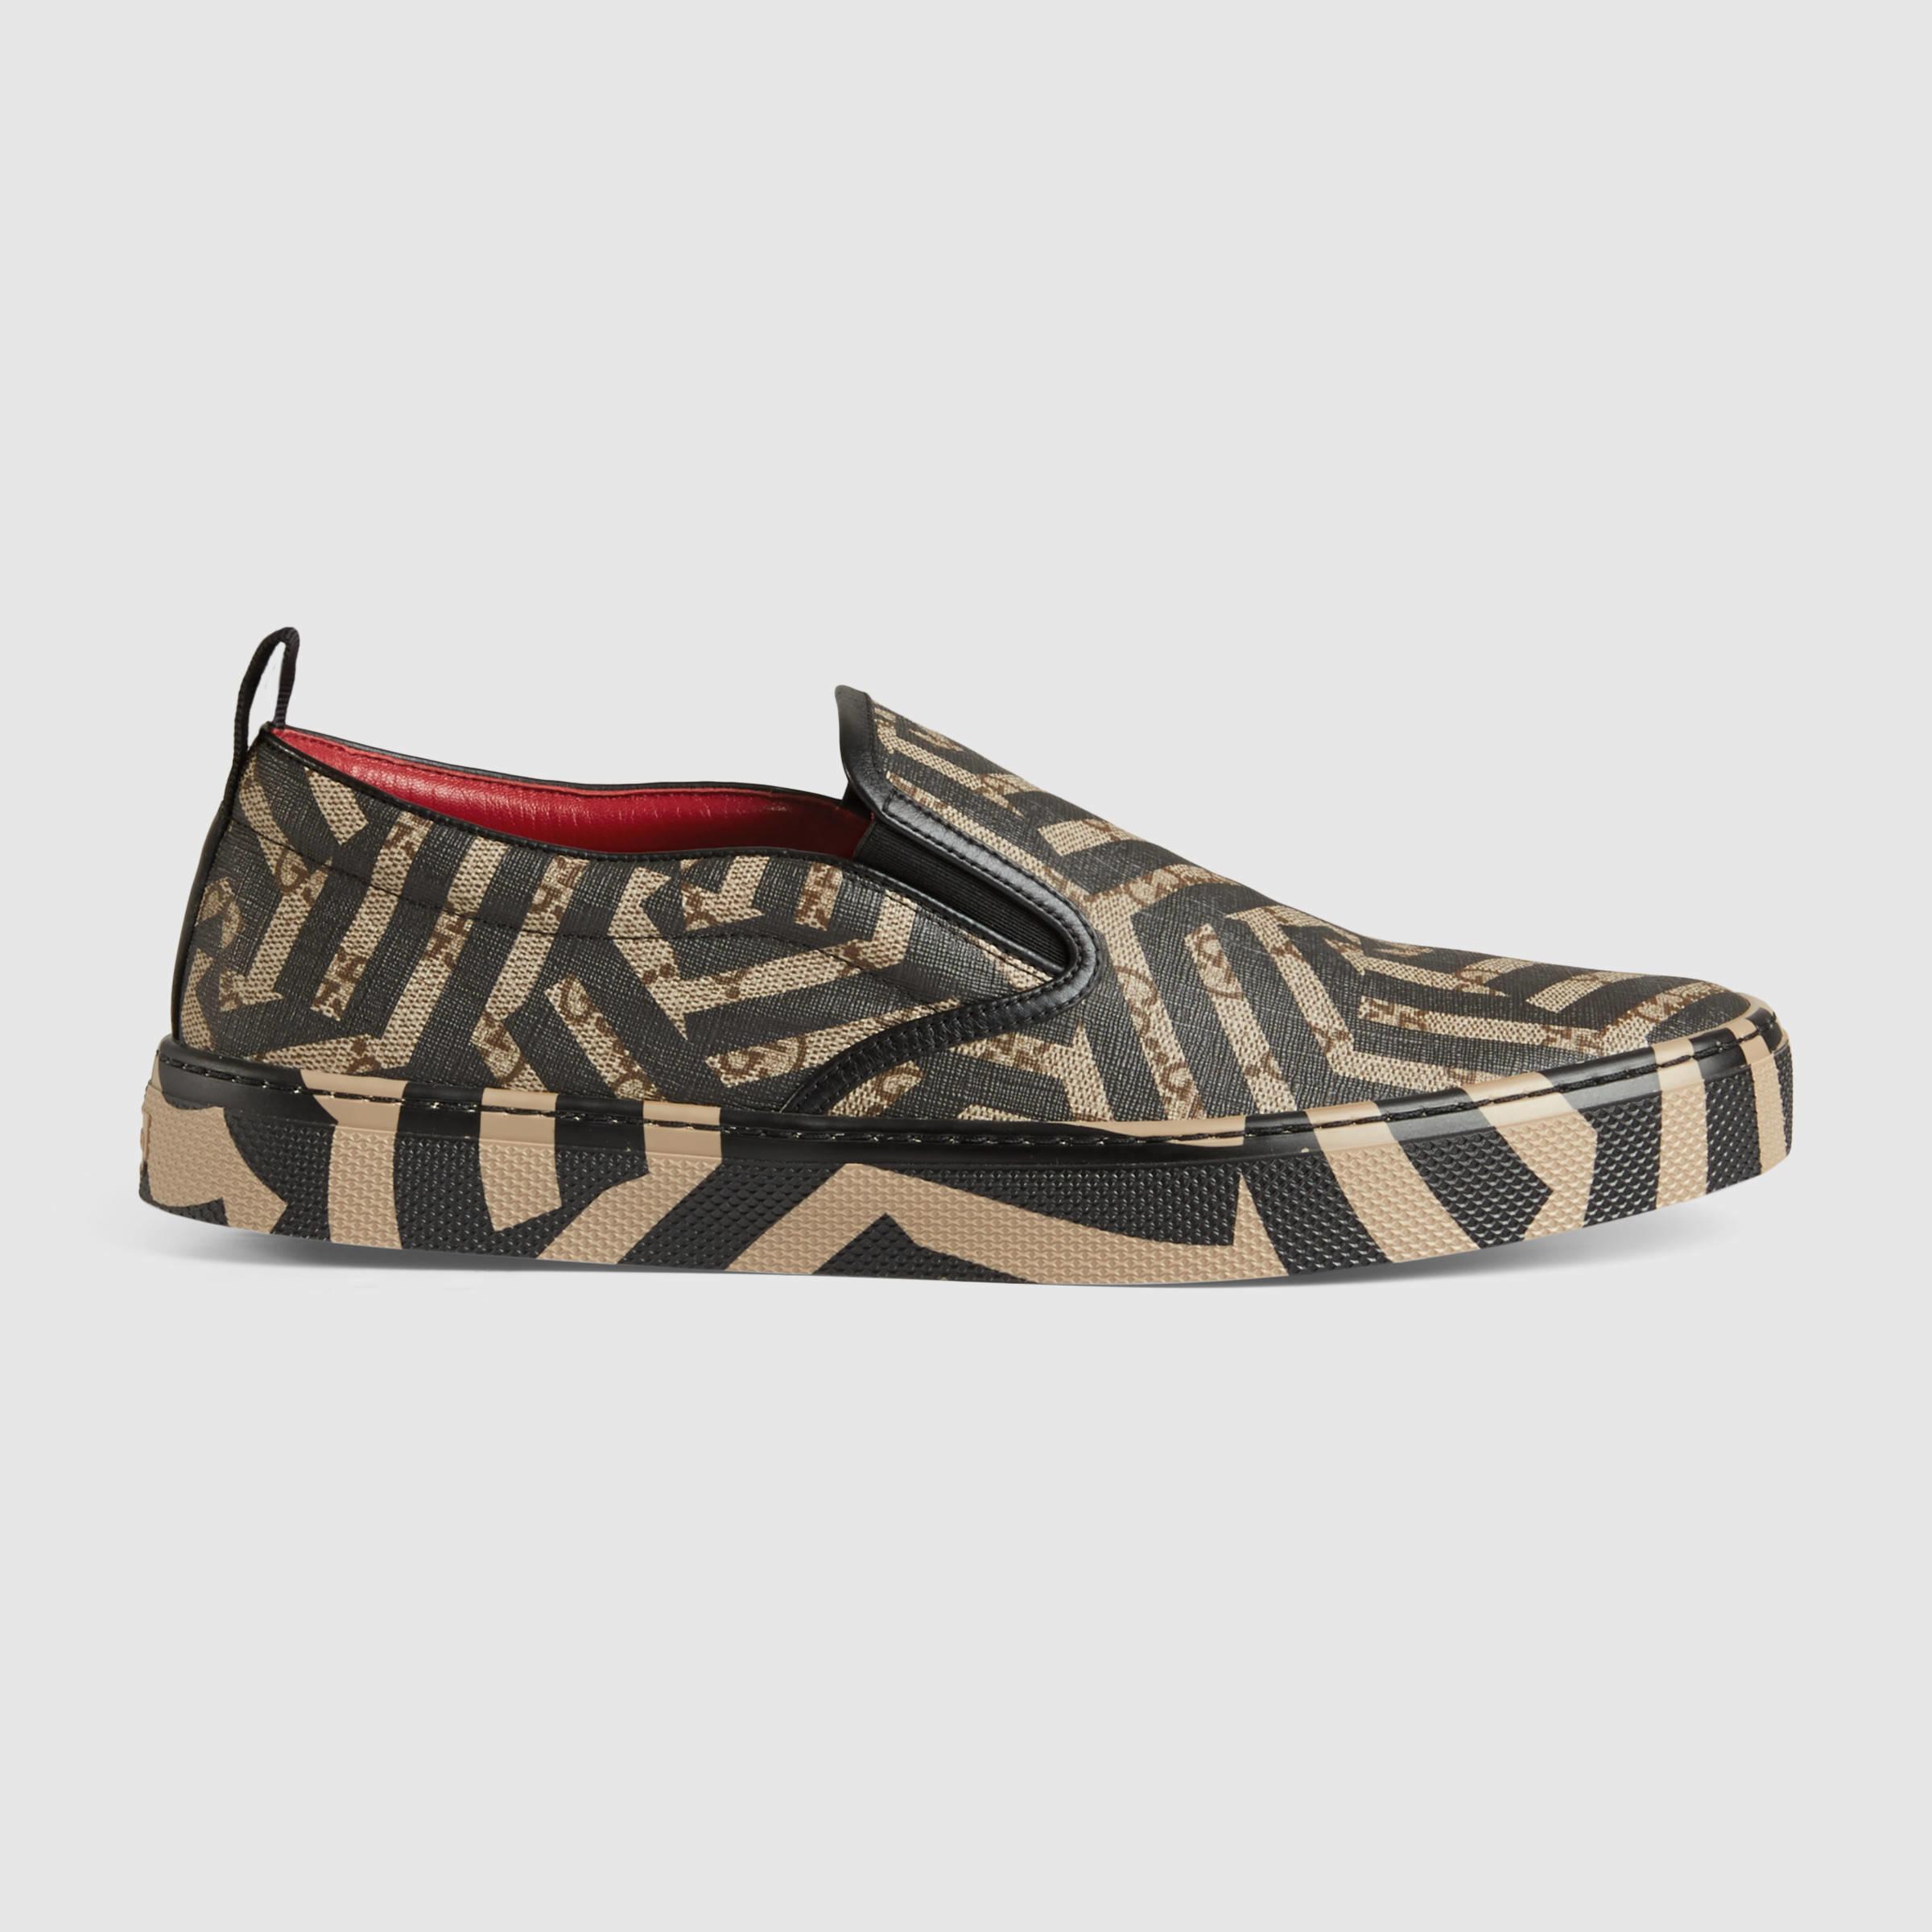 1a6fc5c338d Lyst - Gucci Gg Caleido Sneaker for Men